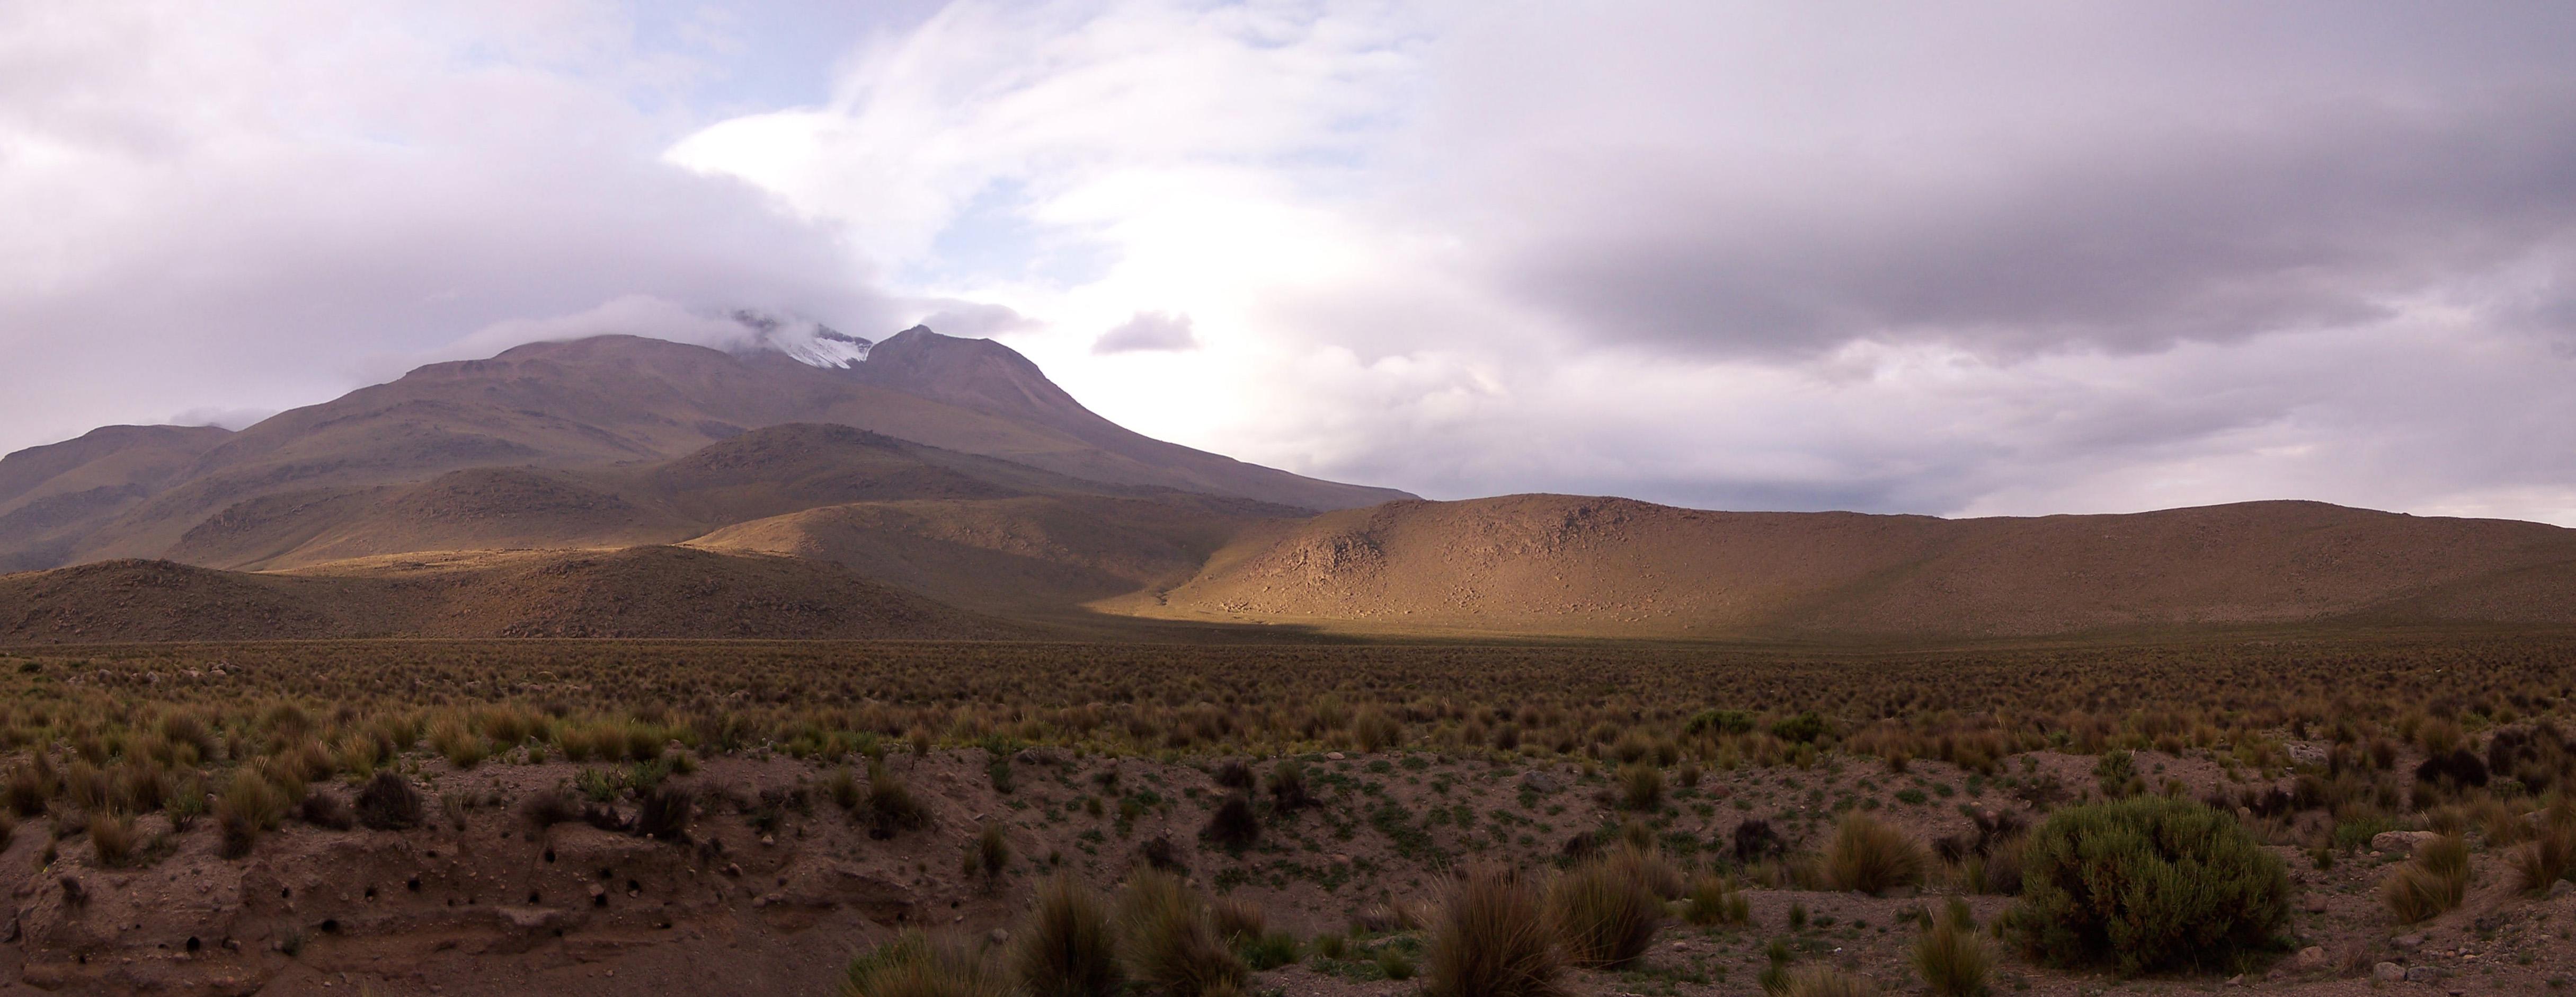 arequipa landscape